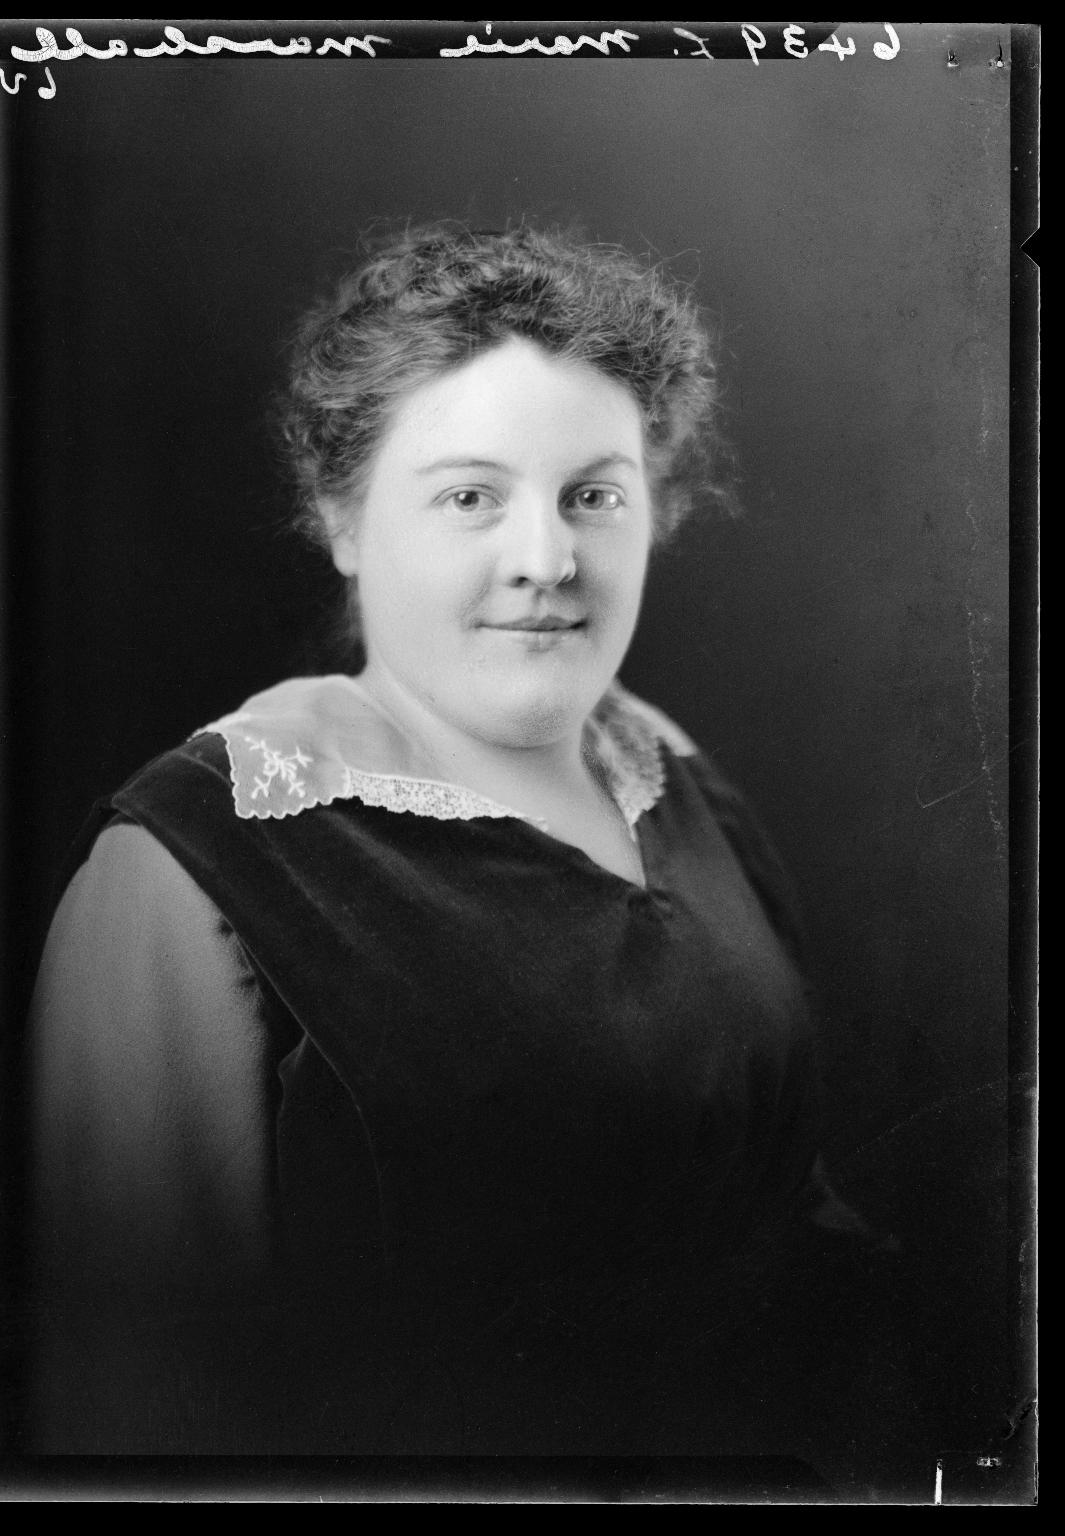 Portraits of L. Marie Marshall